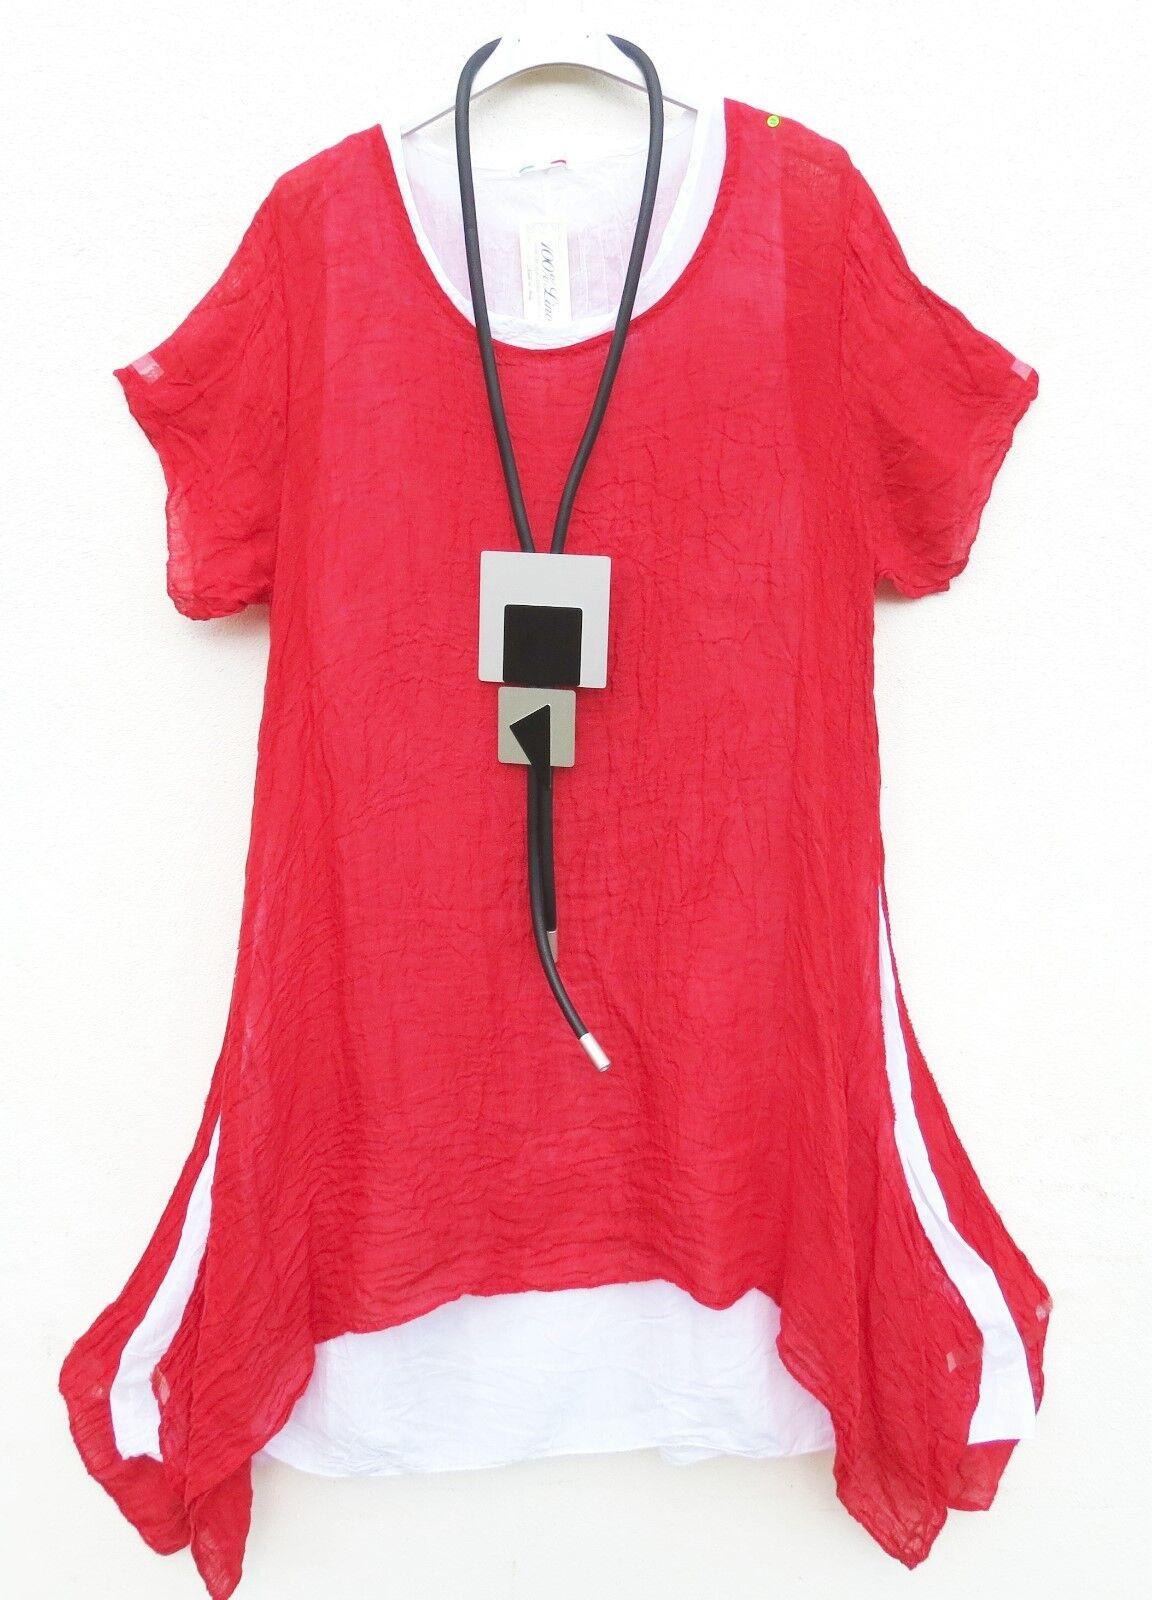 NEU LUIGI Leinen Kleid Long Tunika Linen Dress Robe Vestito L 44 46 Lagenlook